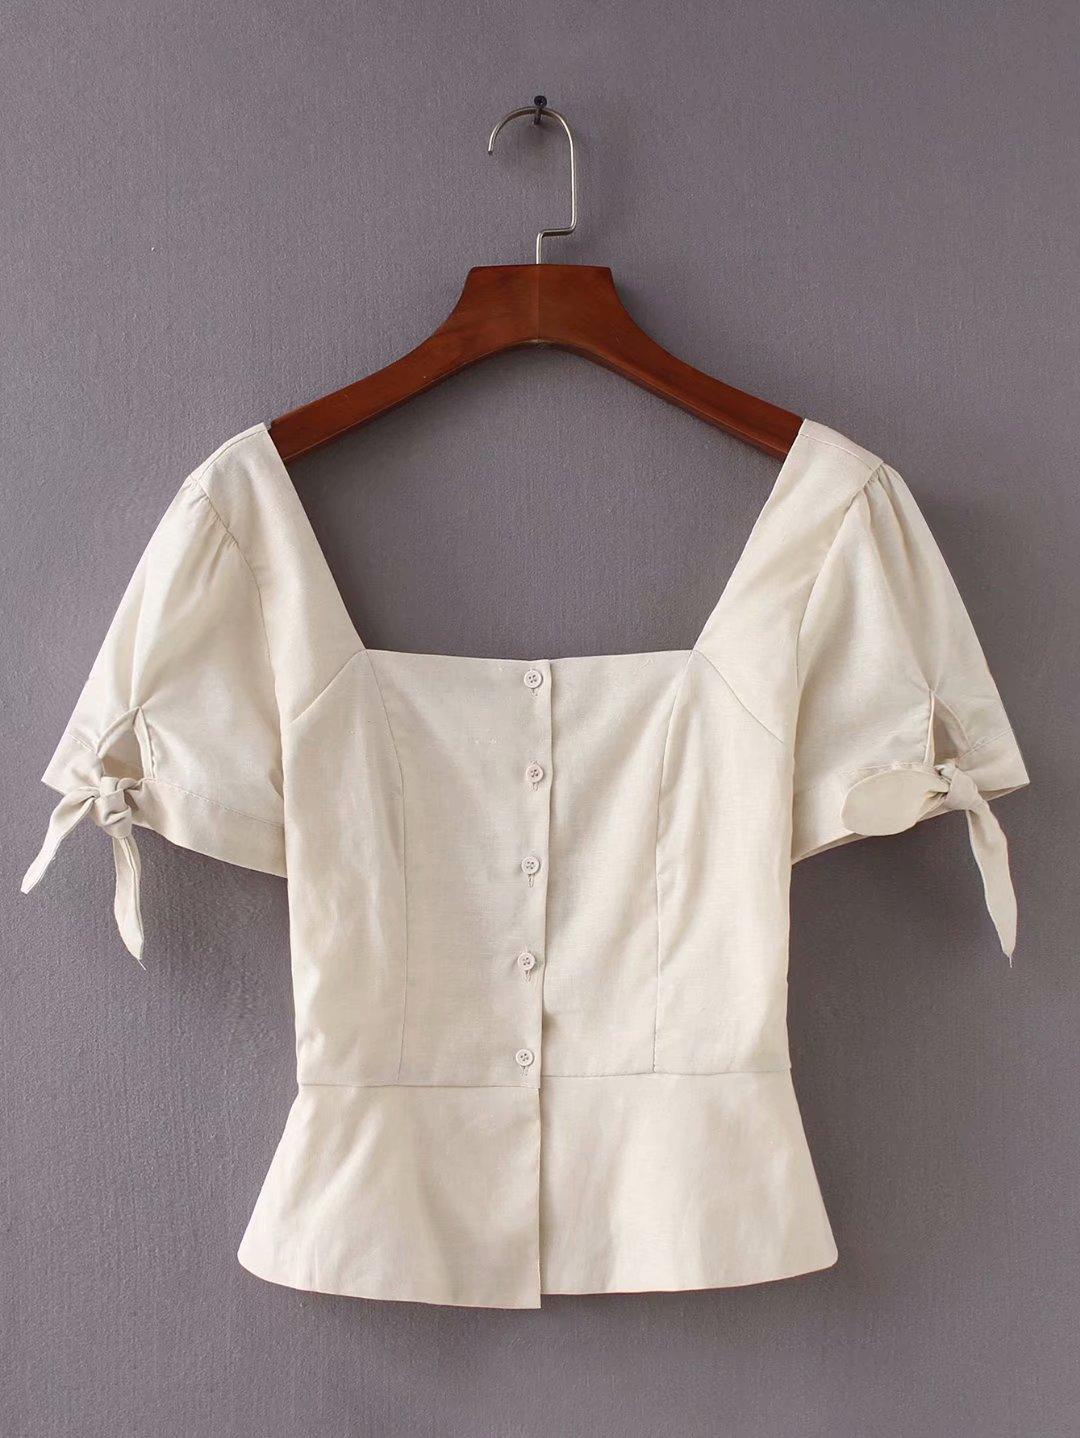 Polyester Fashioncoat(Black-M) NHAM4527-Black-M